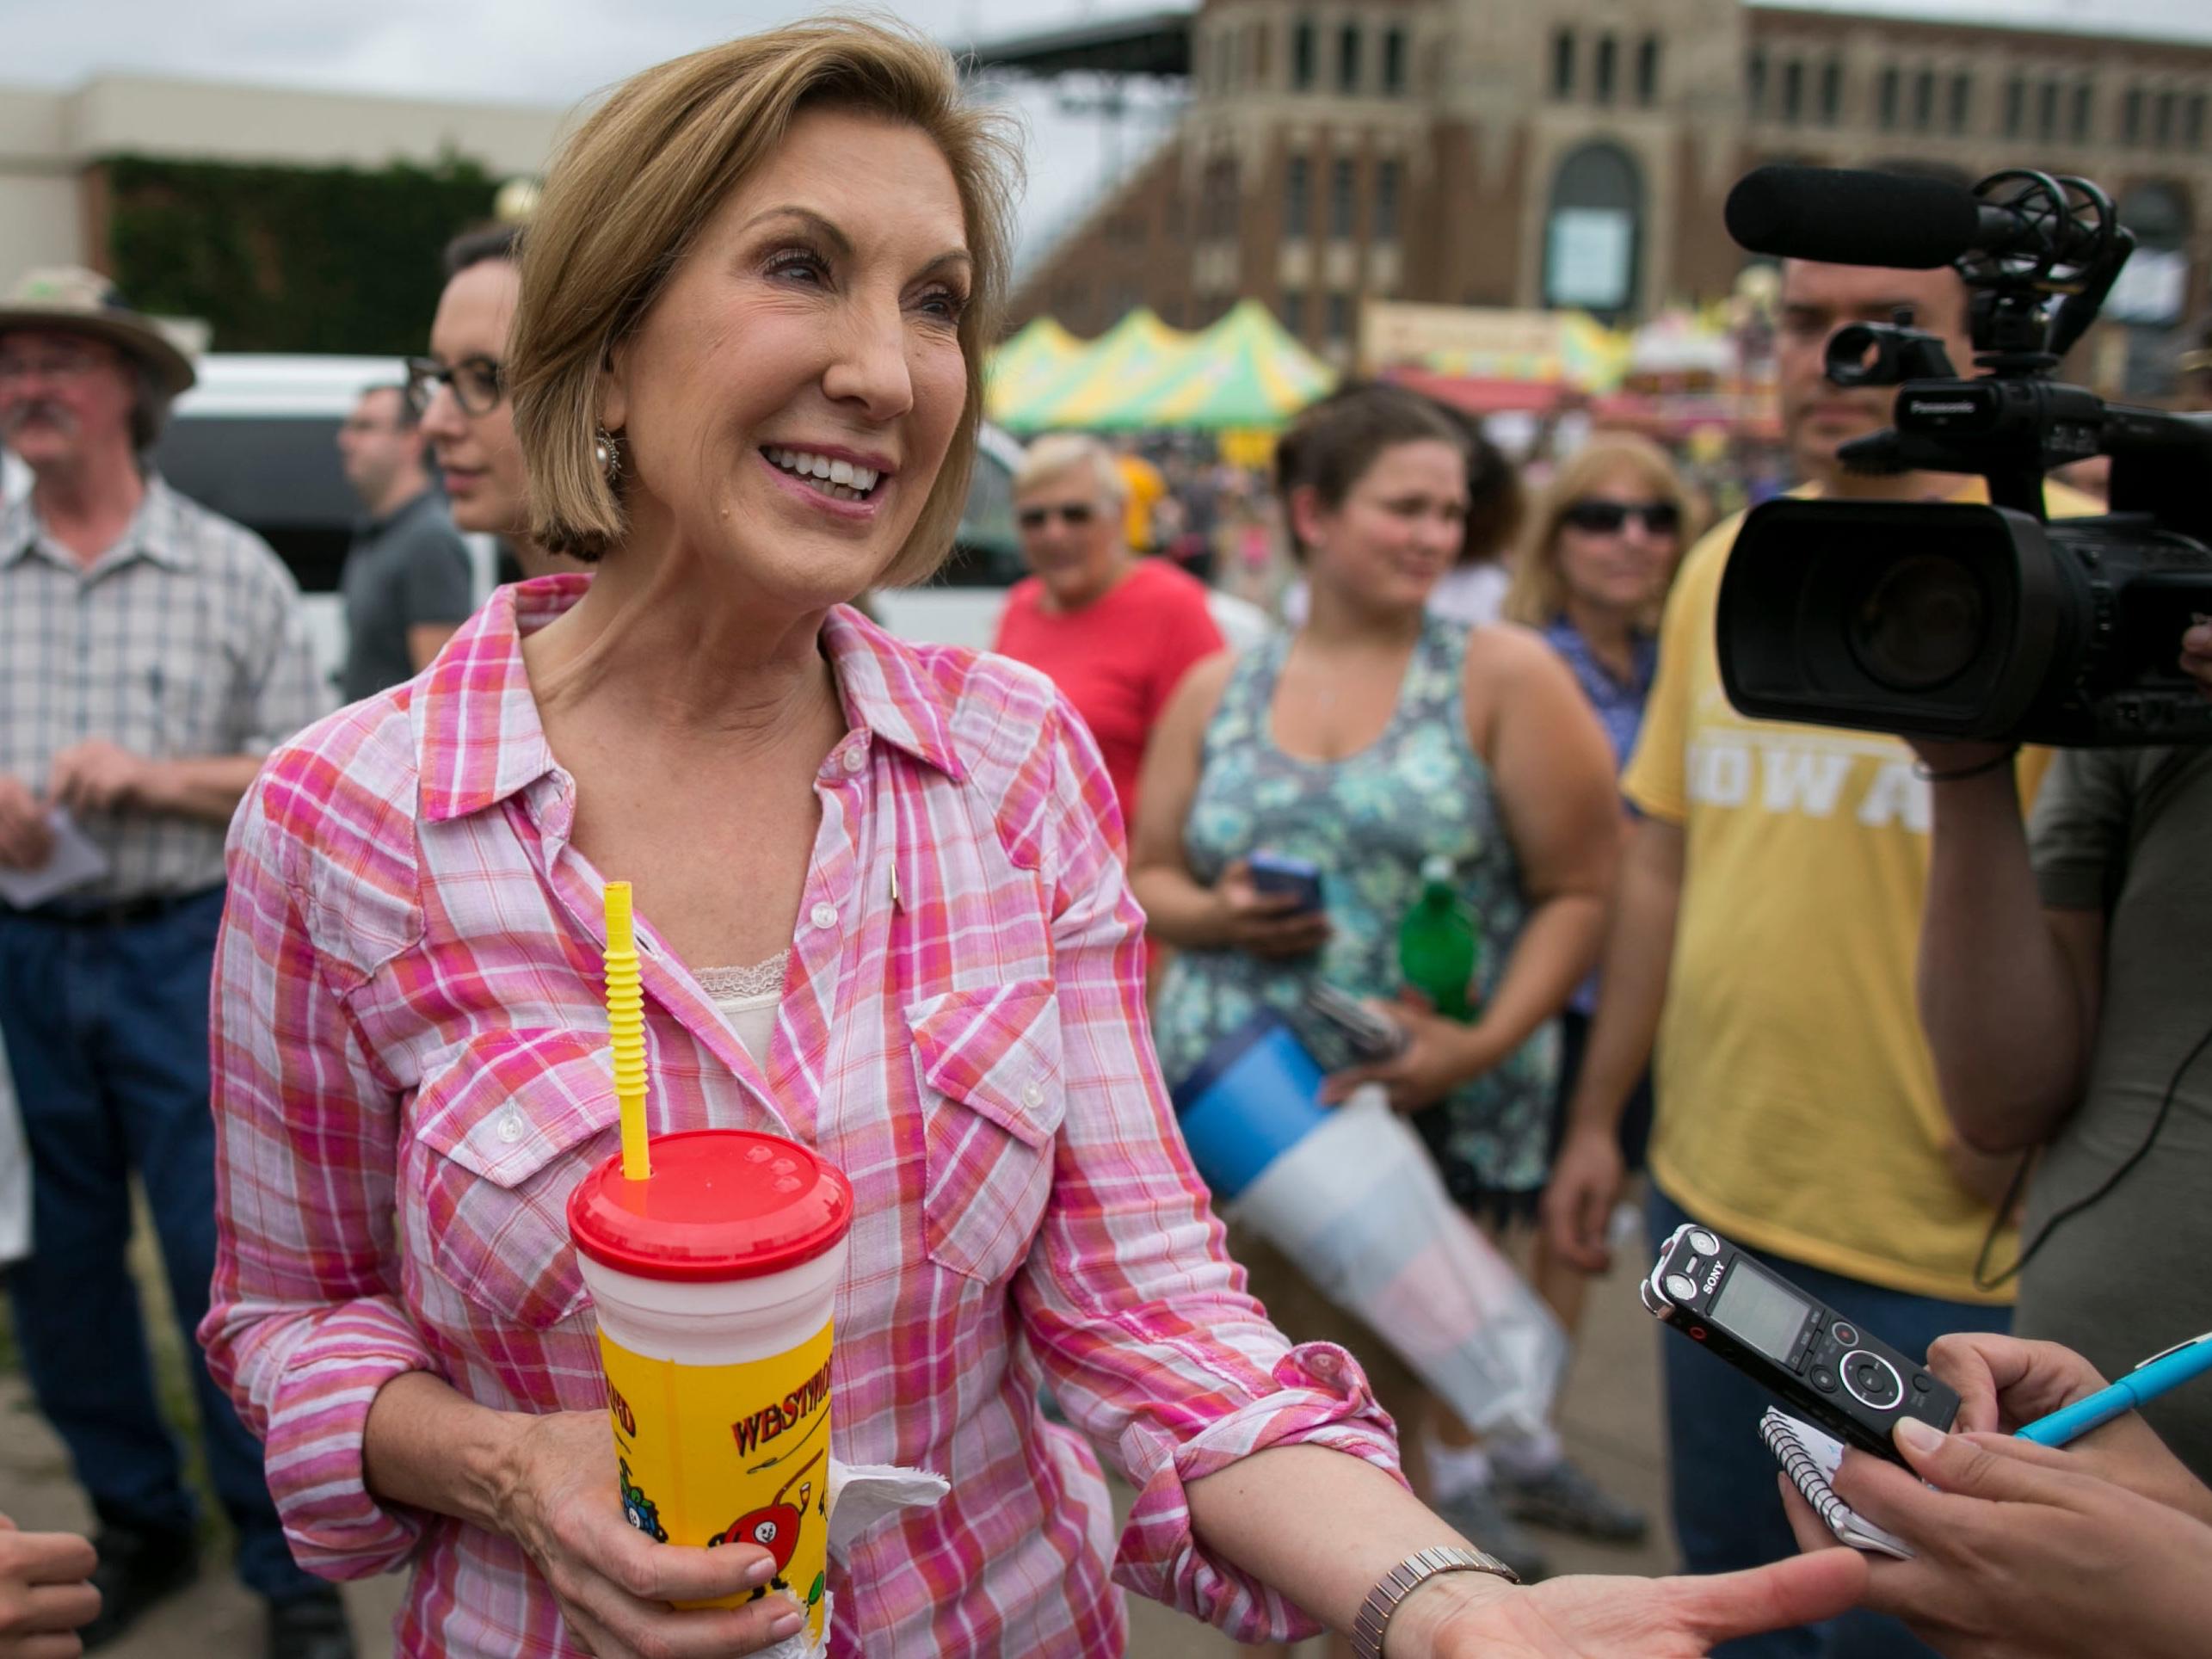 Republican presidential candidate Carly Fiorina at the Iowa State Fair